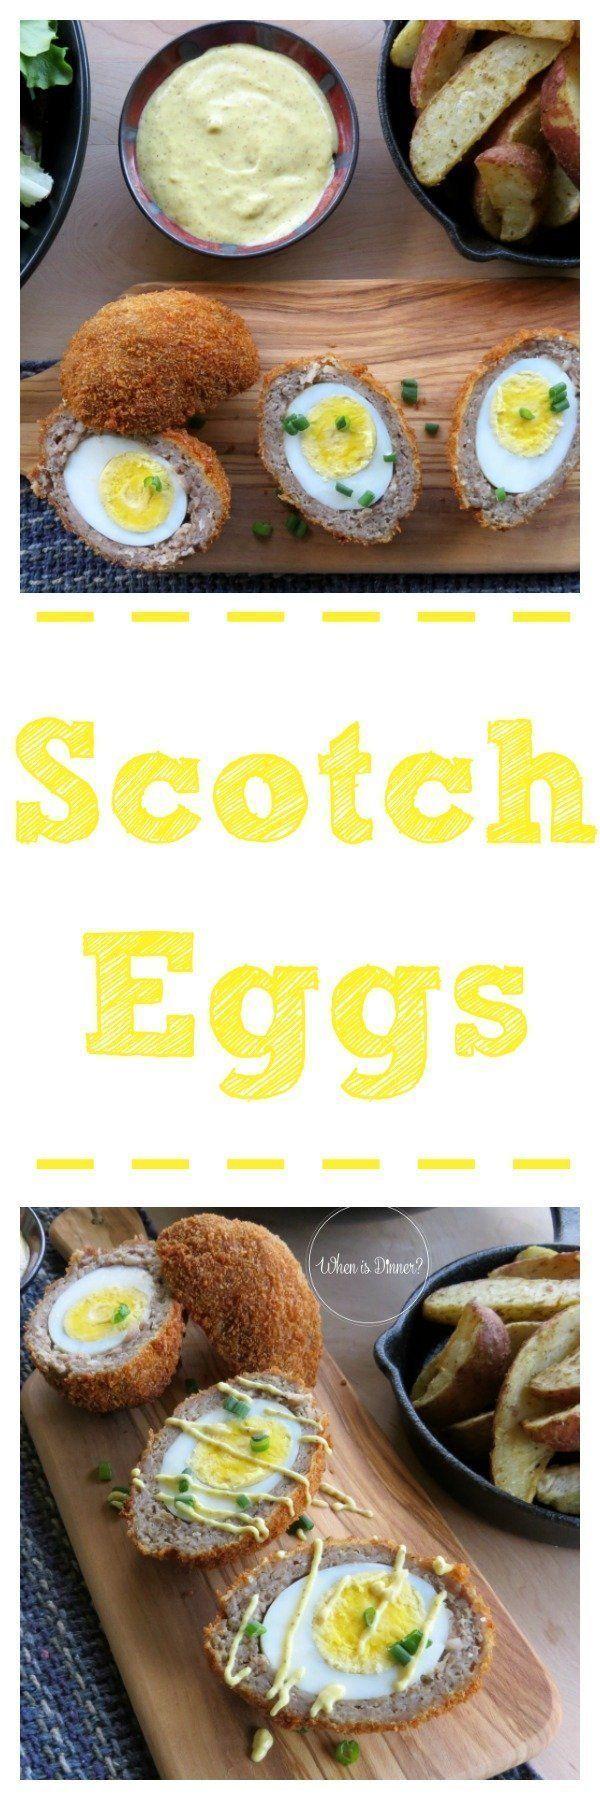 Scotch Eggs #scotcheggs Scotch Eggs #ScotchEggs #EggRecipes #scotcheggs